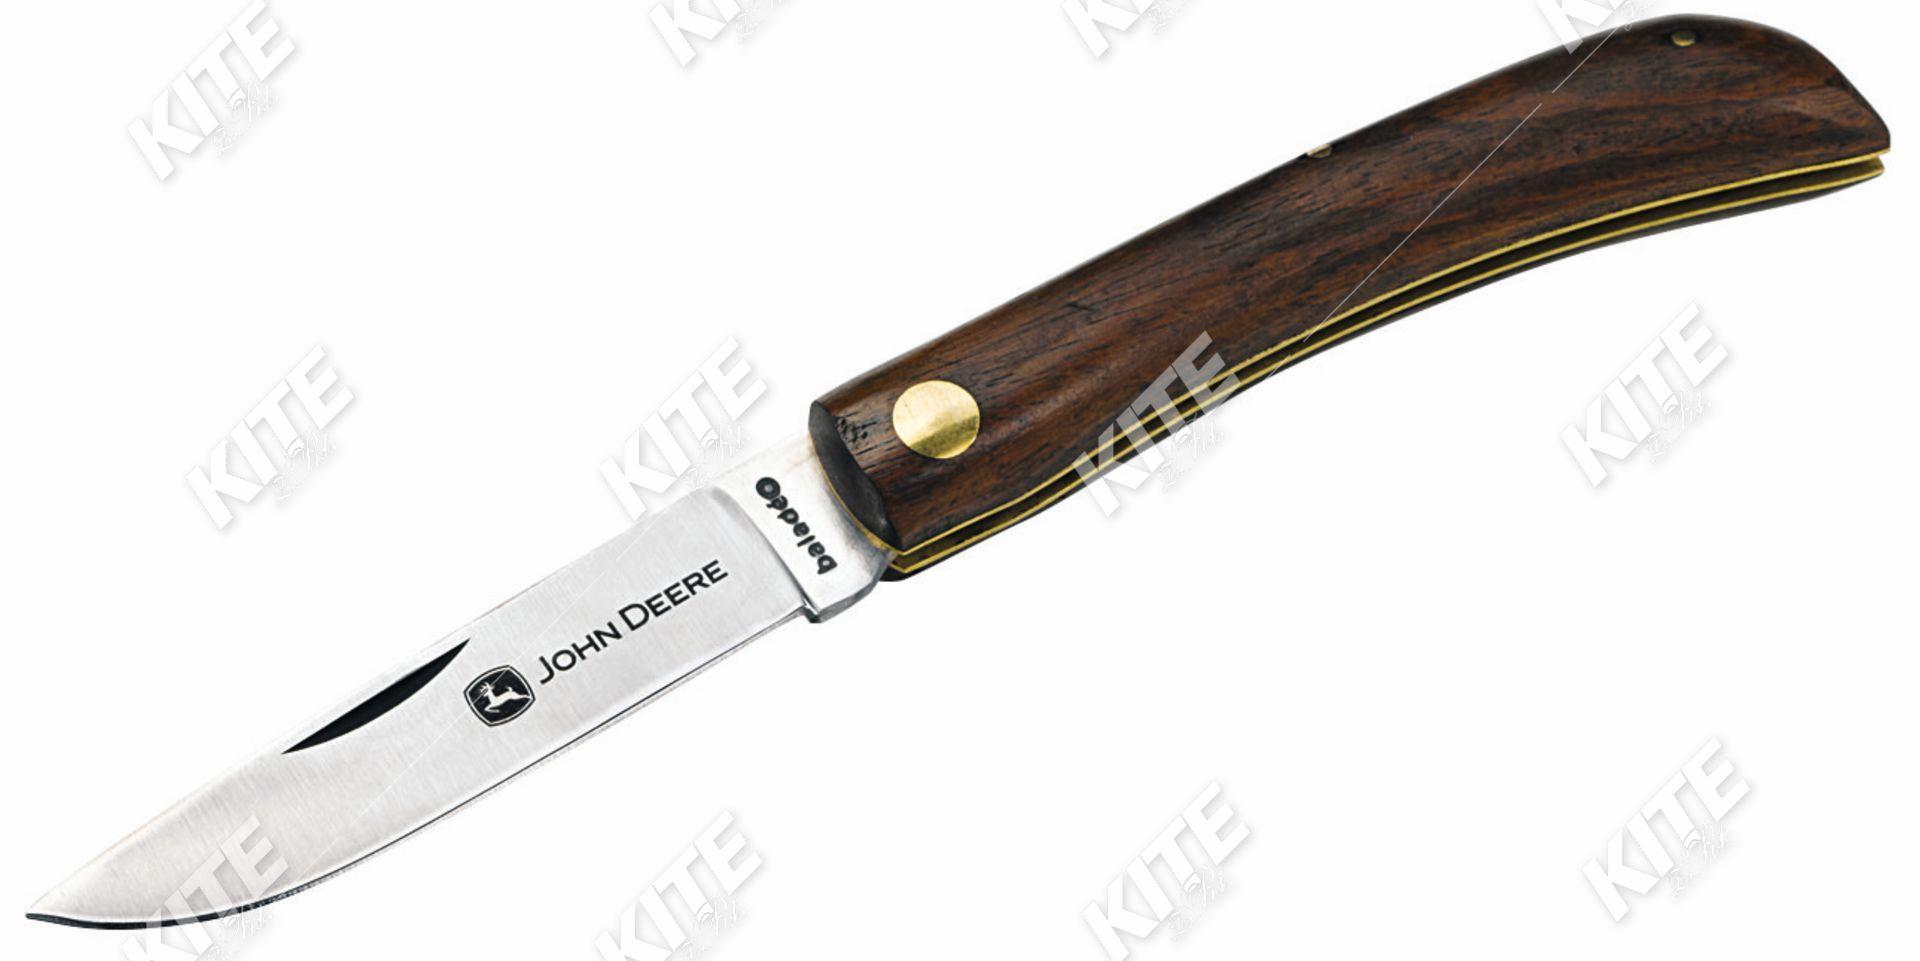 John Deere kés